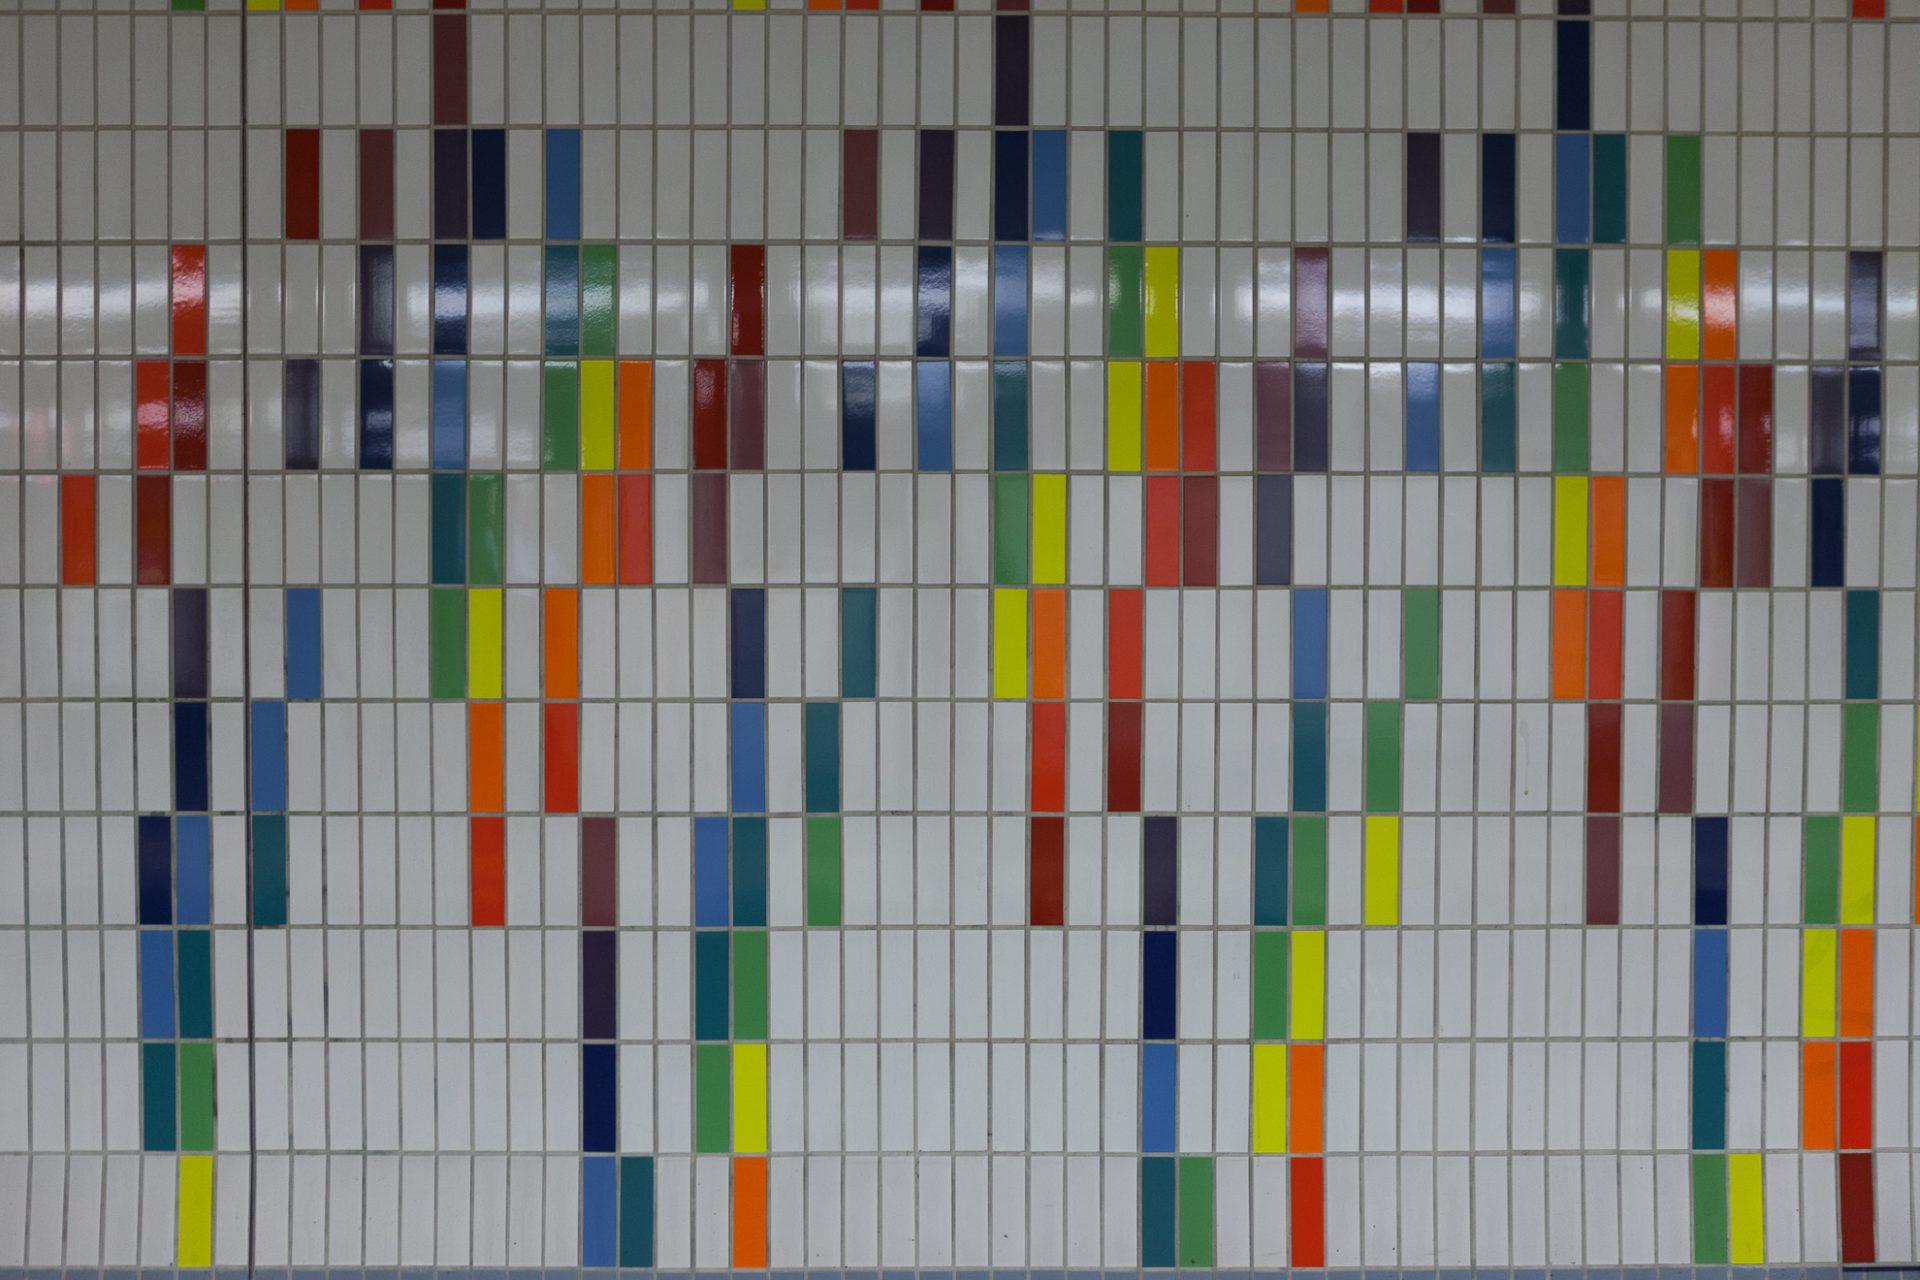 U6 – Tiles